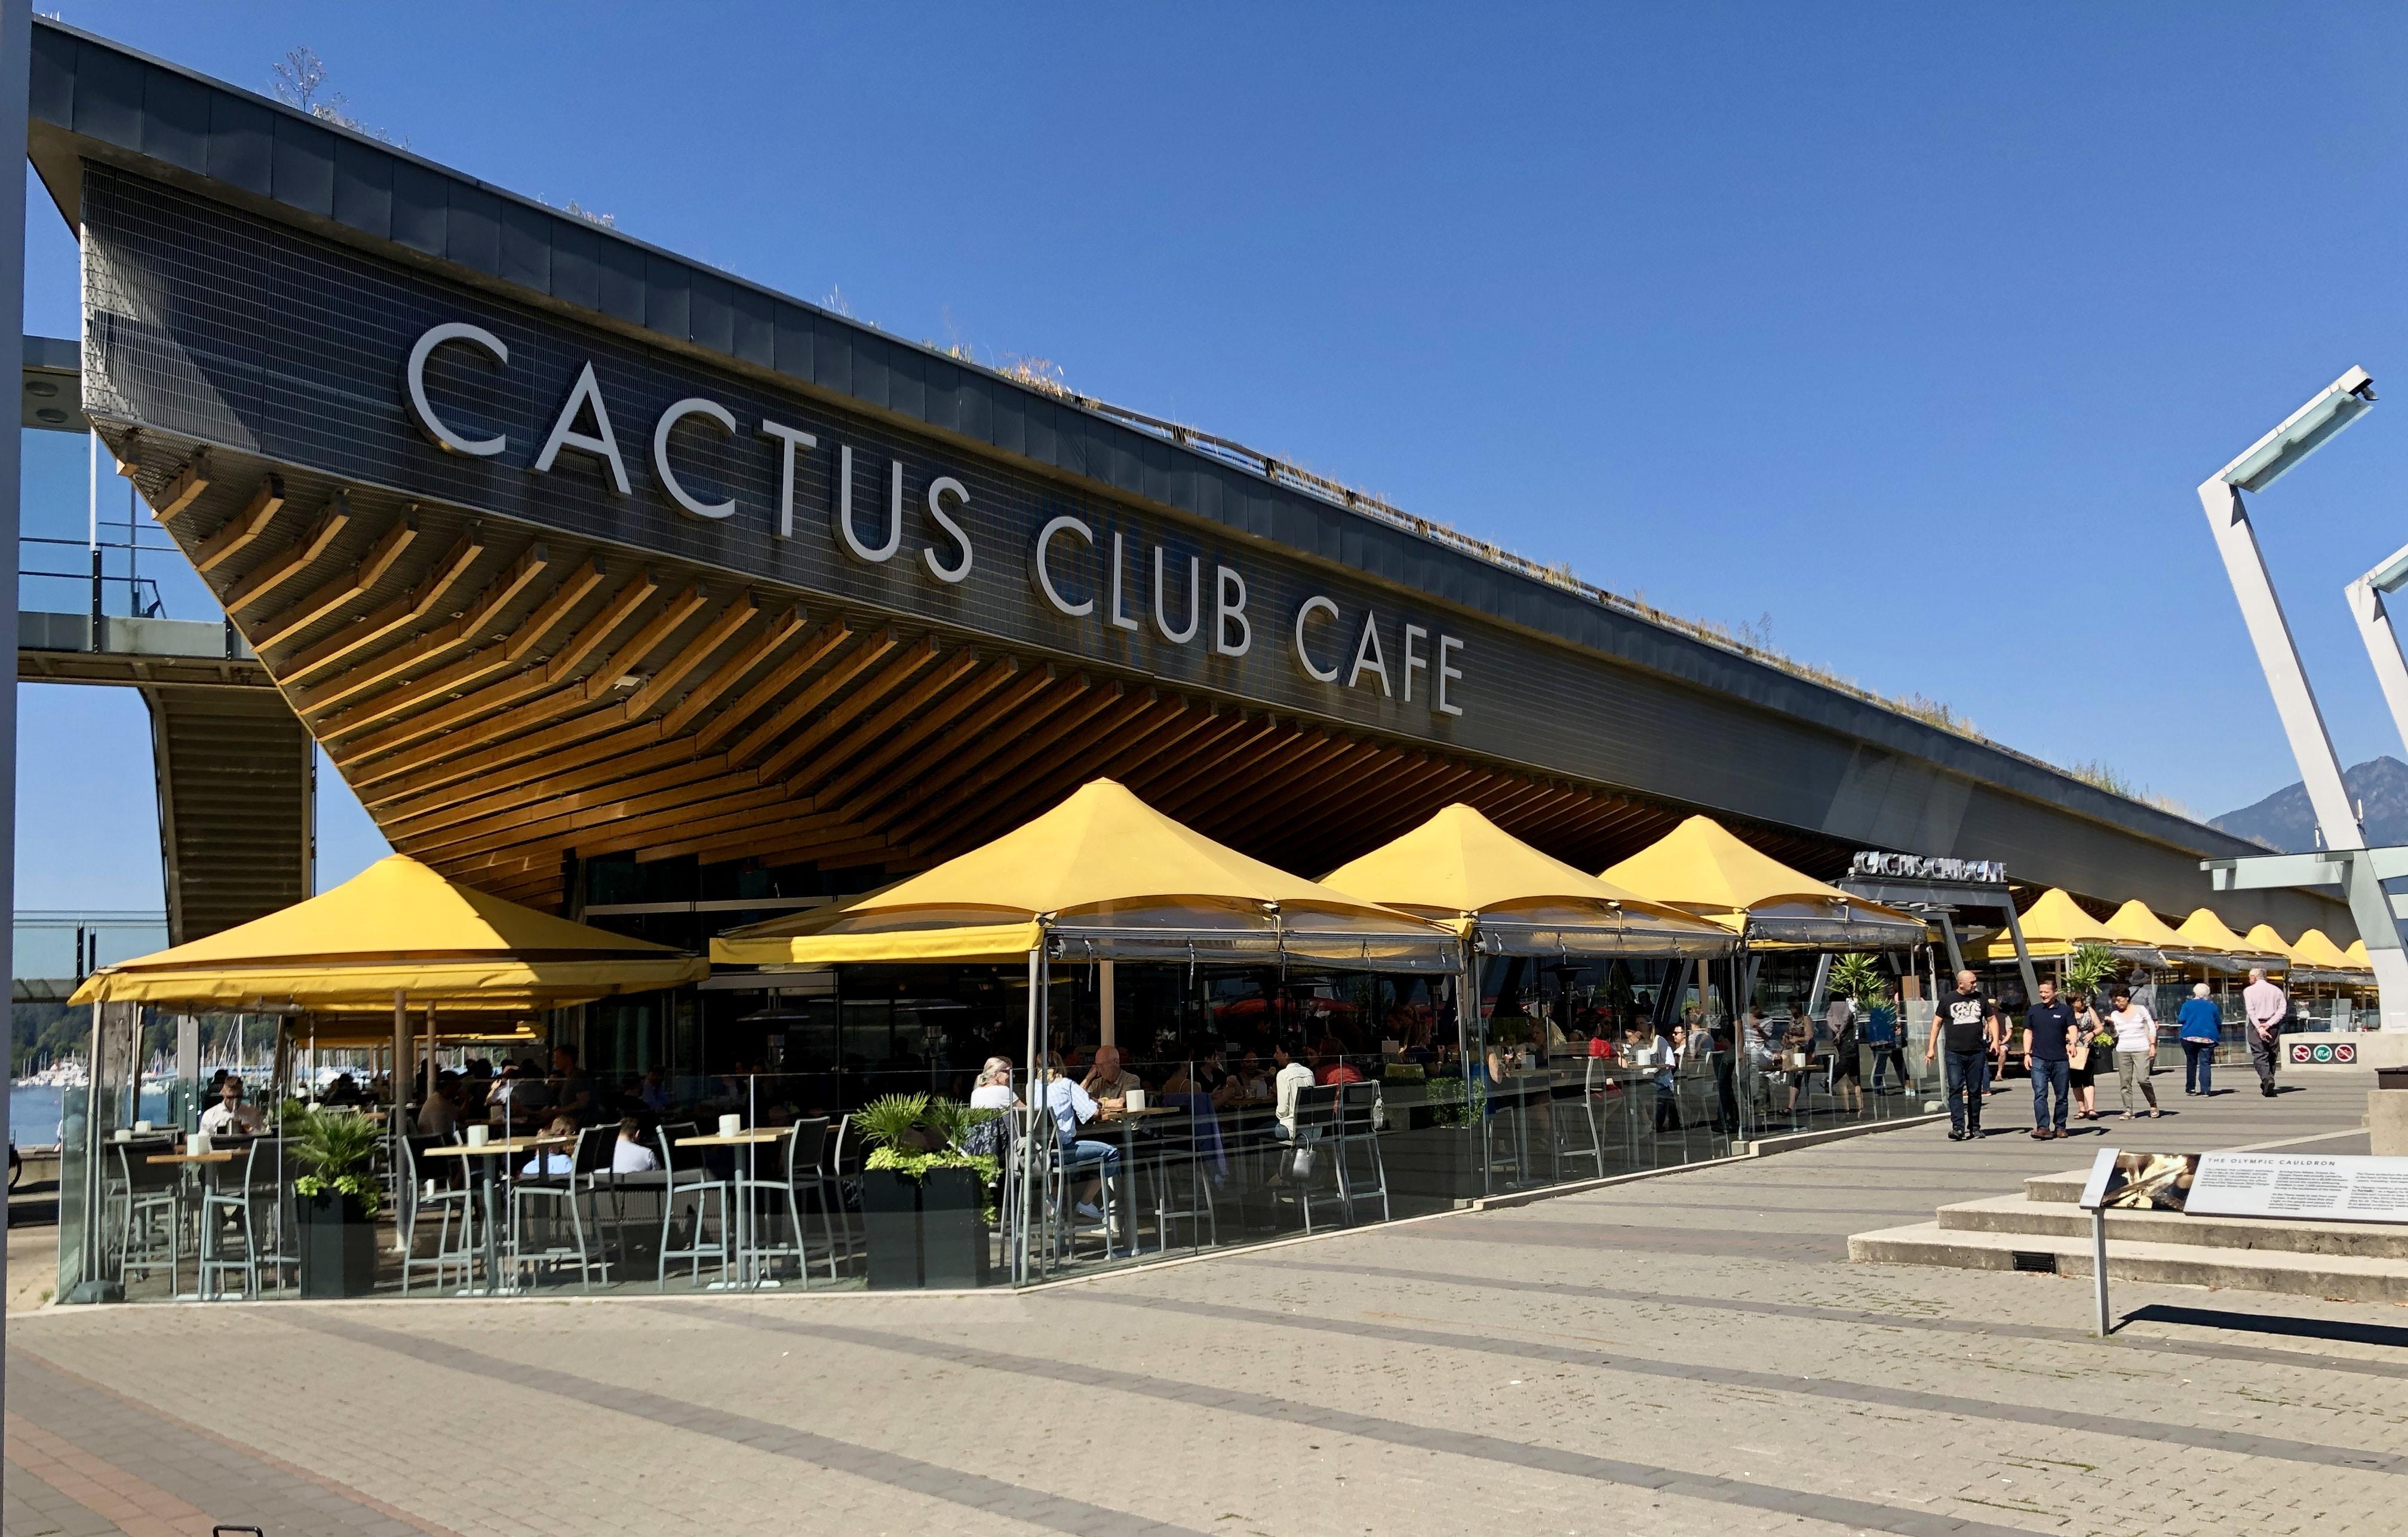 Cactus Club Cafe Vancouver